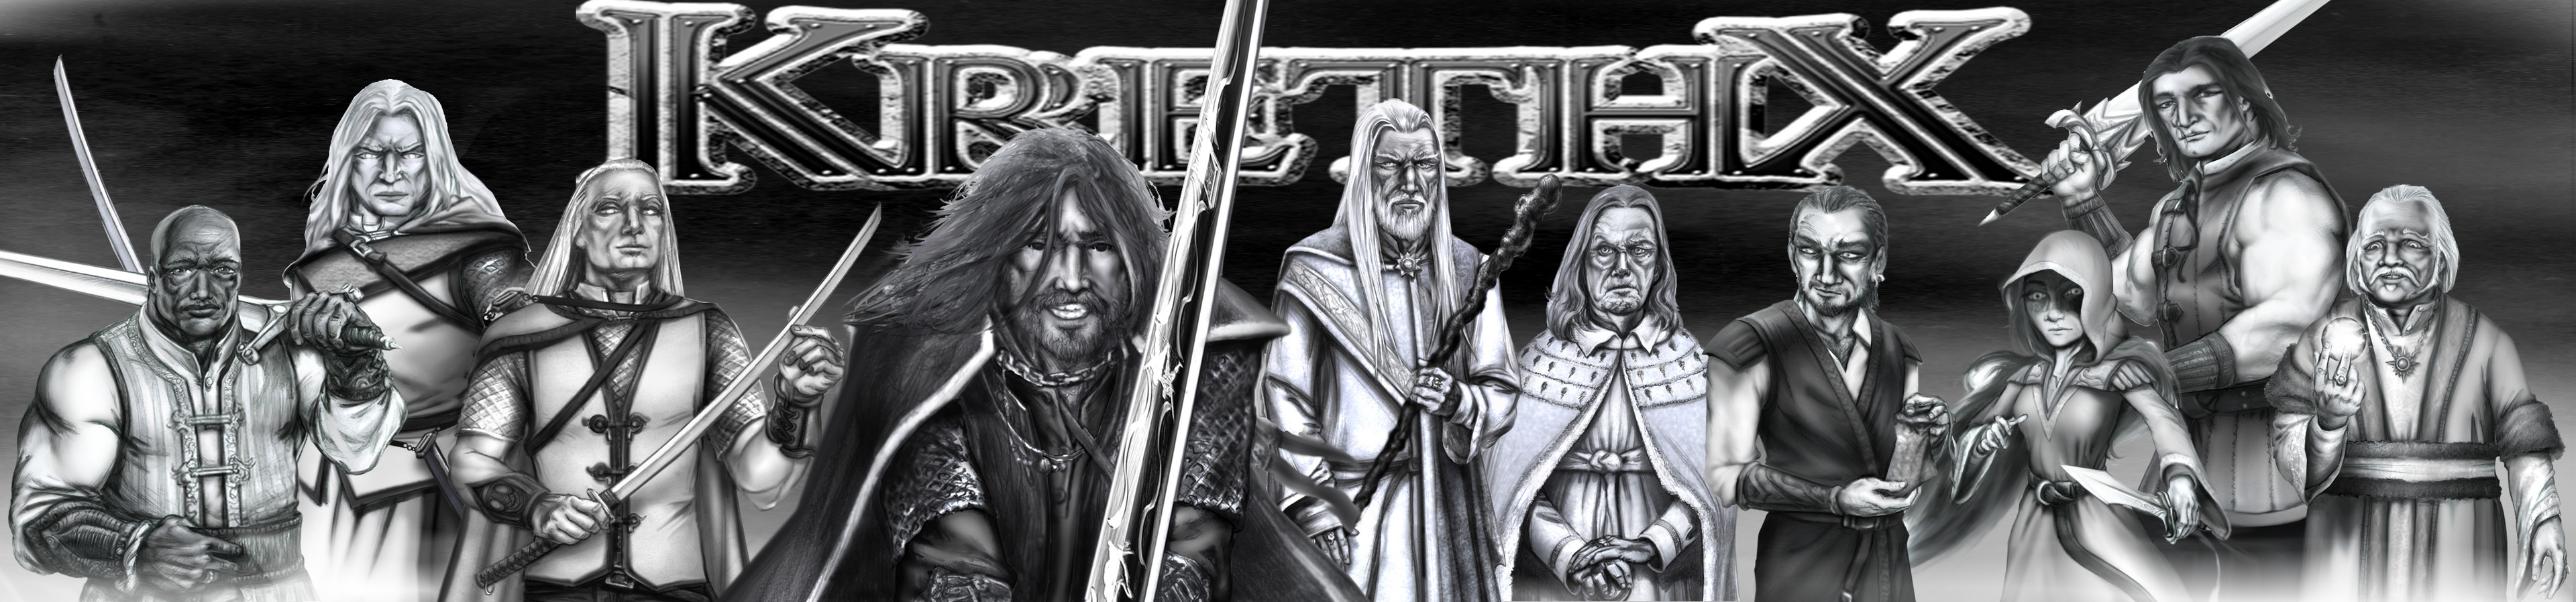 Krethx character poster